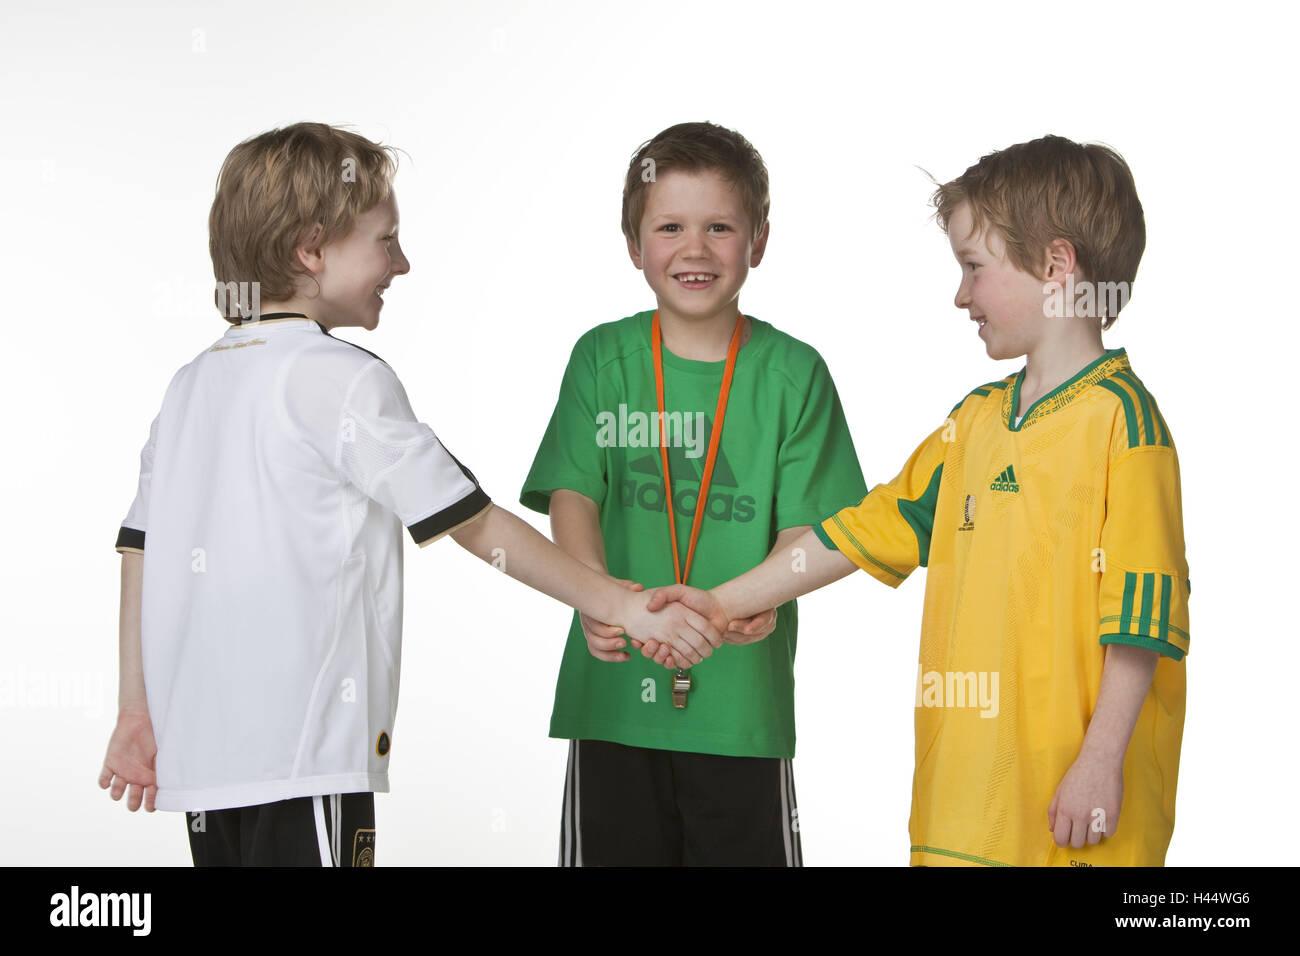 Football Cups Stockfotos & Football Cups Bilder - Alamy